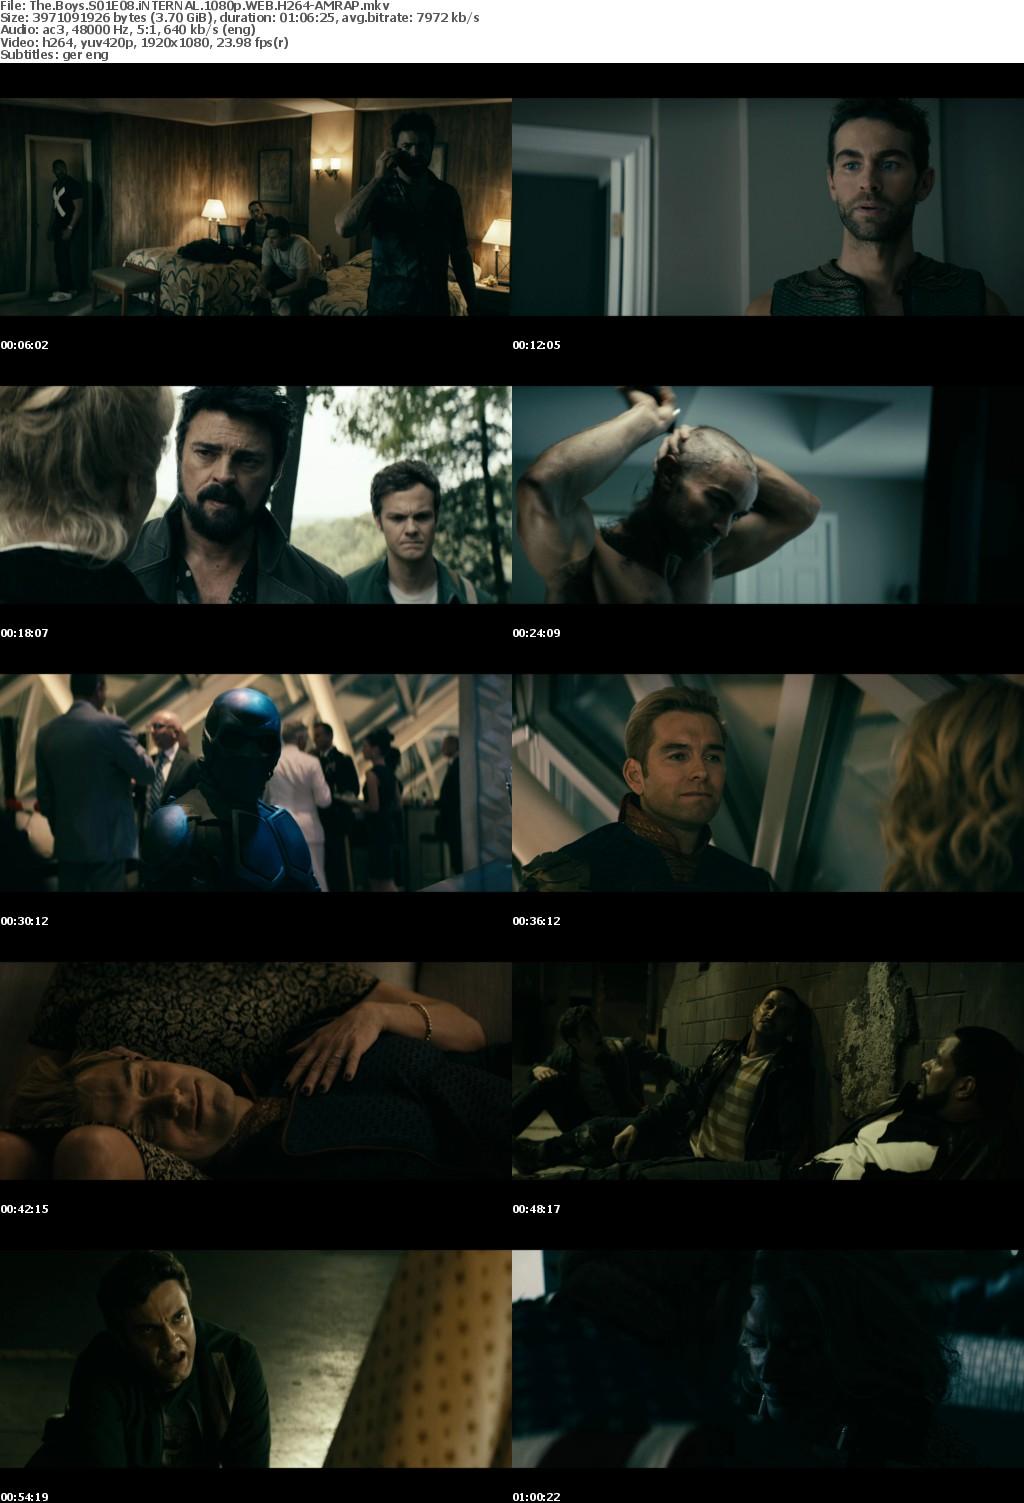 The Boys S01E08 iNTERNAL 1080p WEB H264-AMRAP